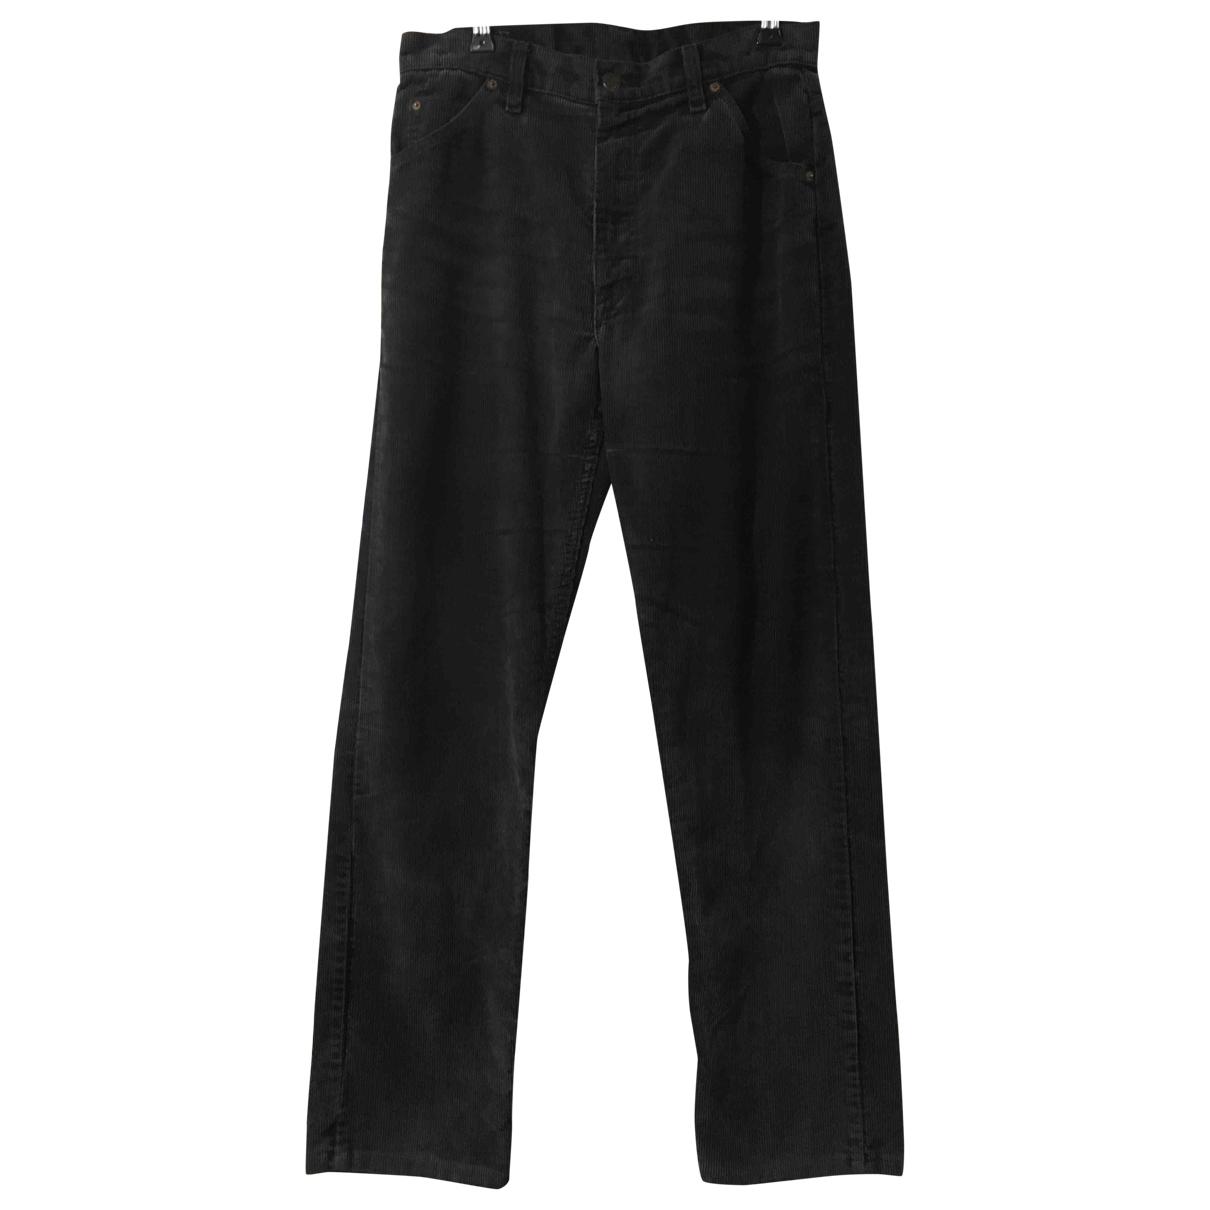 Levi's \N Black Cotton Trousers for Men 32 UK - US